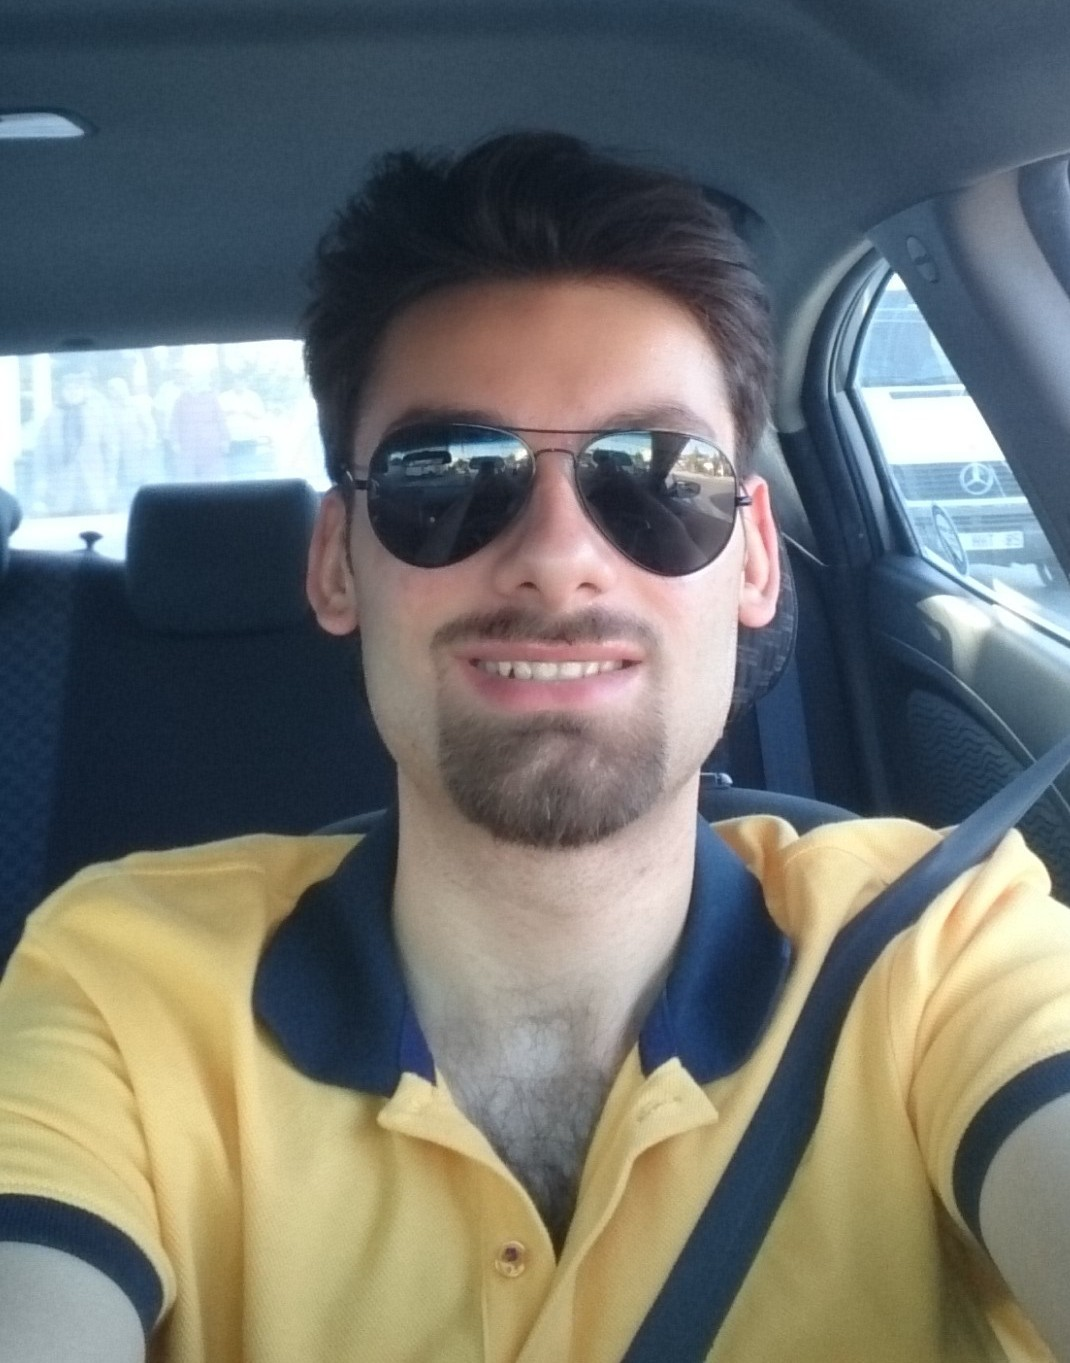 Oguzhan_Toretto